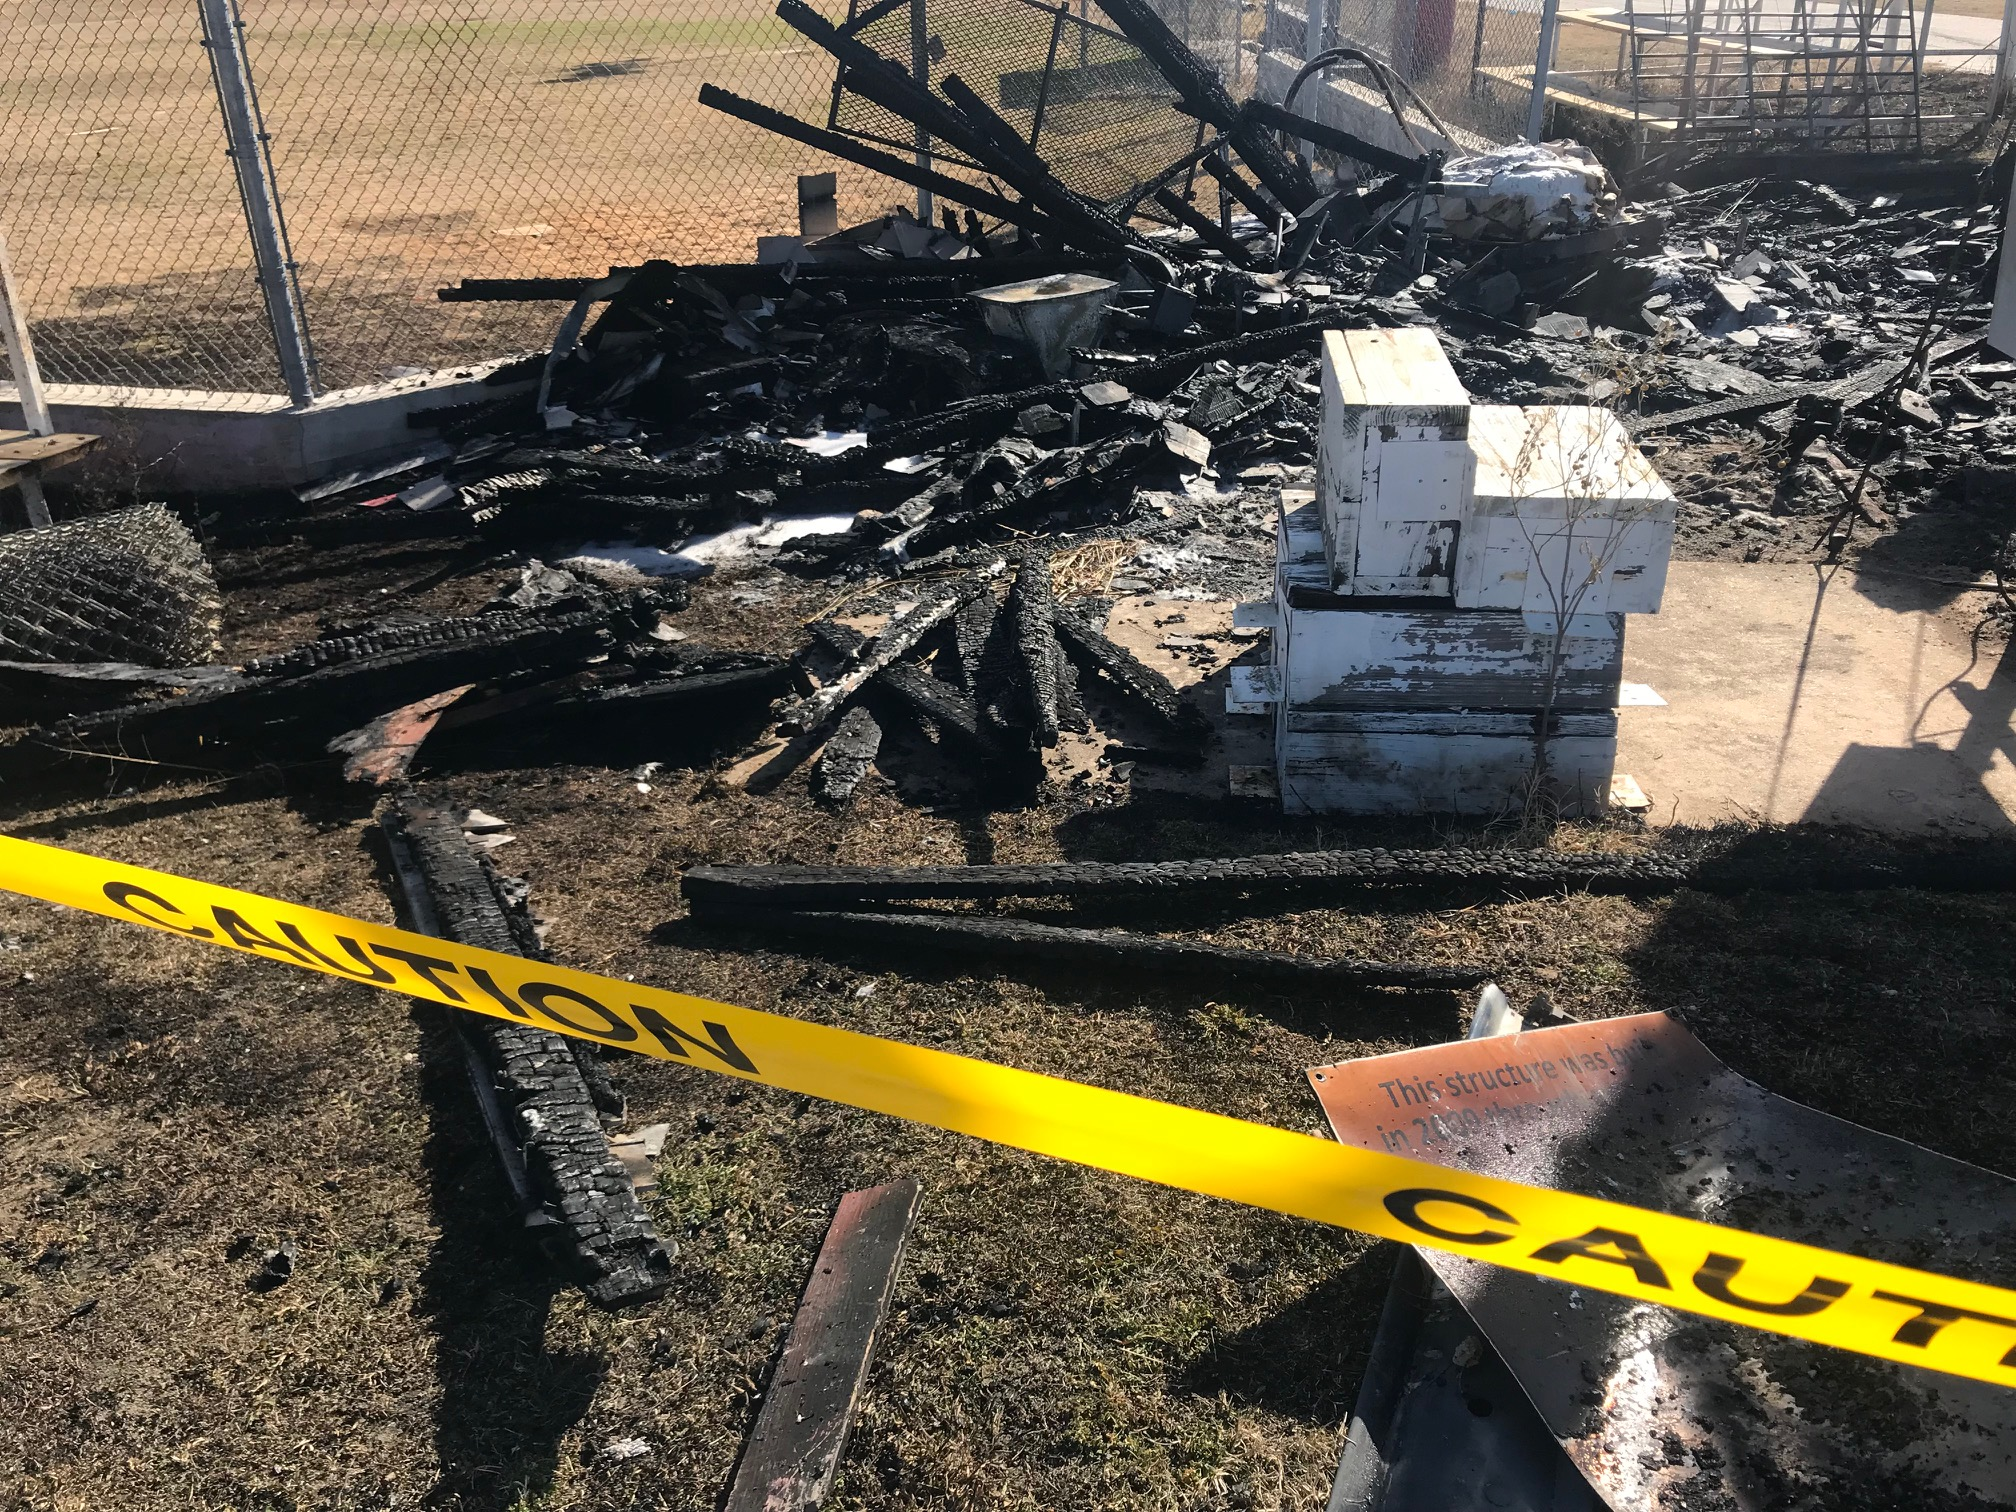 A fire engulfed the announcer's box at a Manor baseball field Jan. 22, 2018 (KXAN Photo/Frank Martinez)